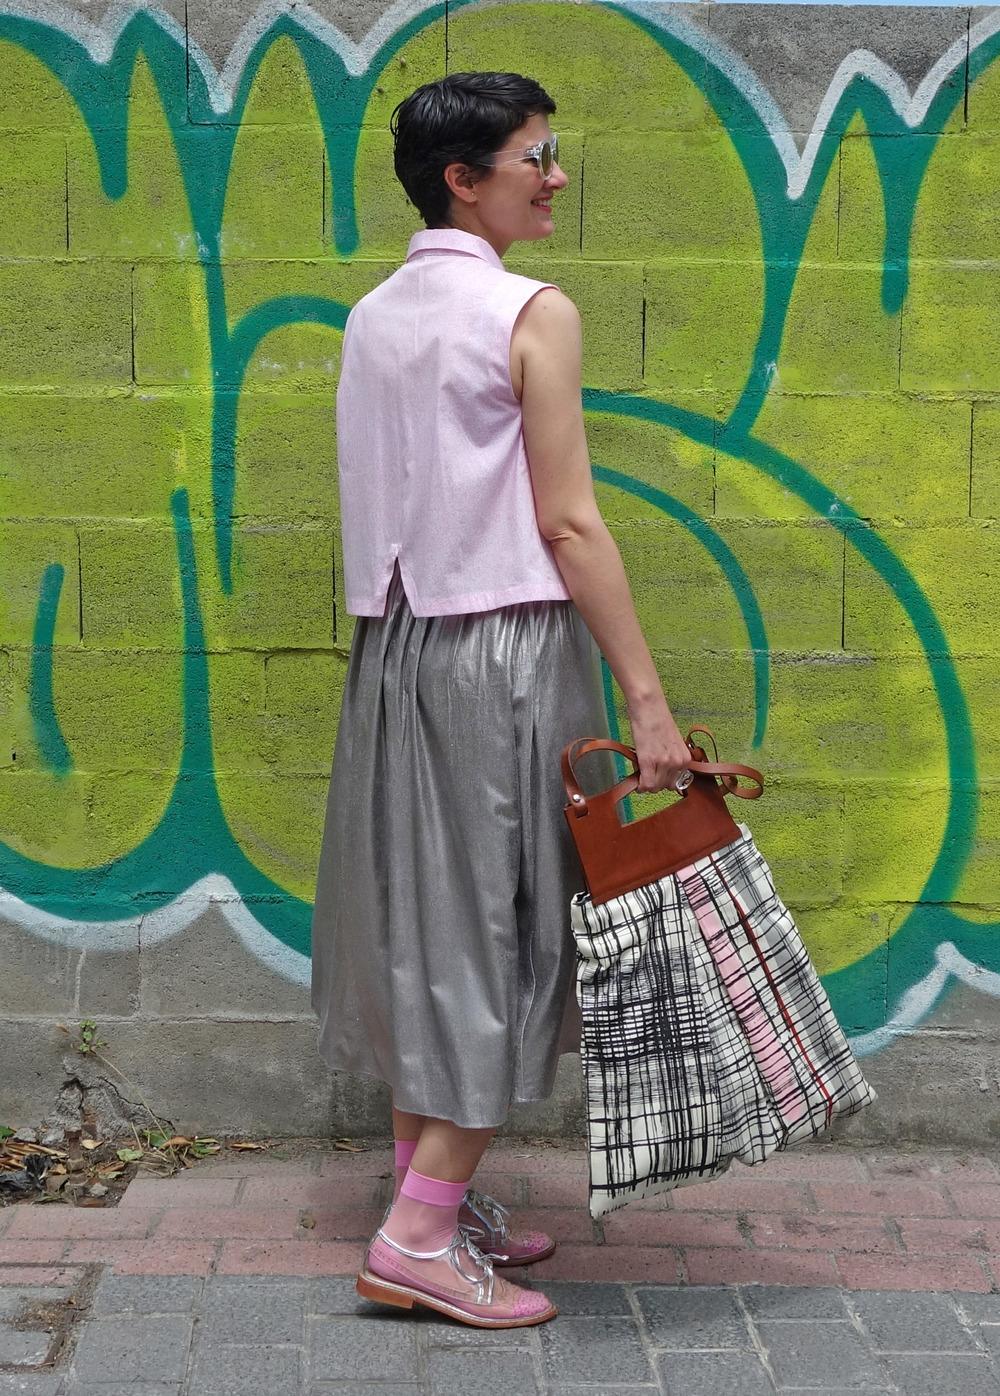 Back_To_Trendy_Airova_Shirt_Silver_Skirt_Transparent_Shoes_1.JPG